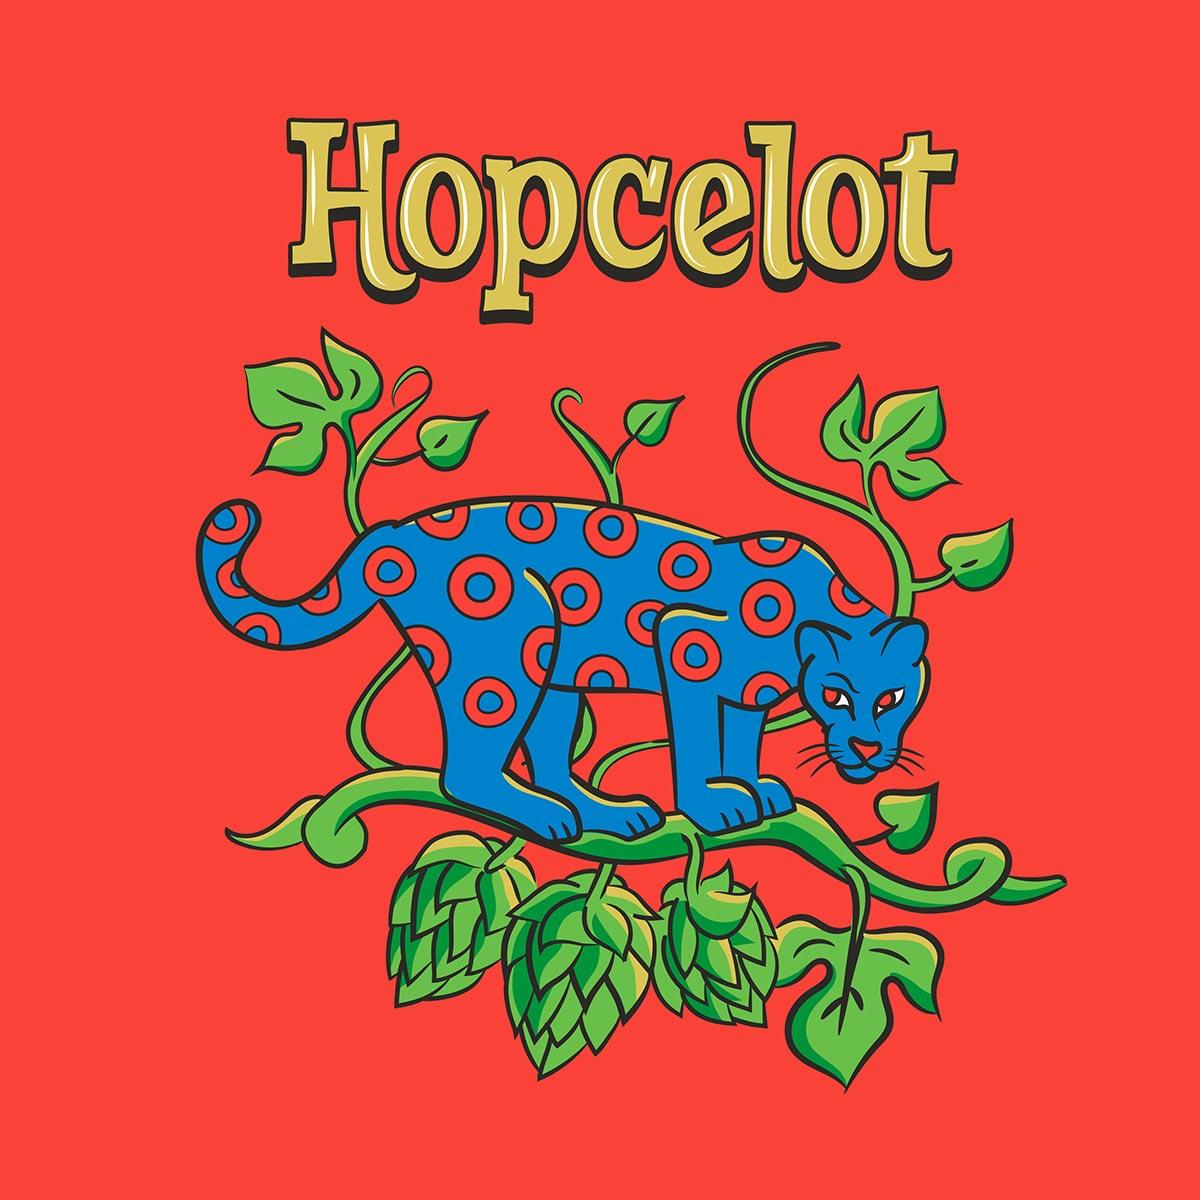 Hopcelot - IPA